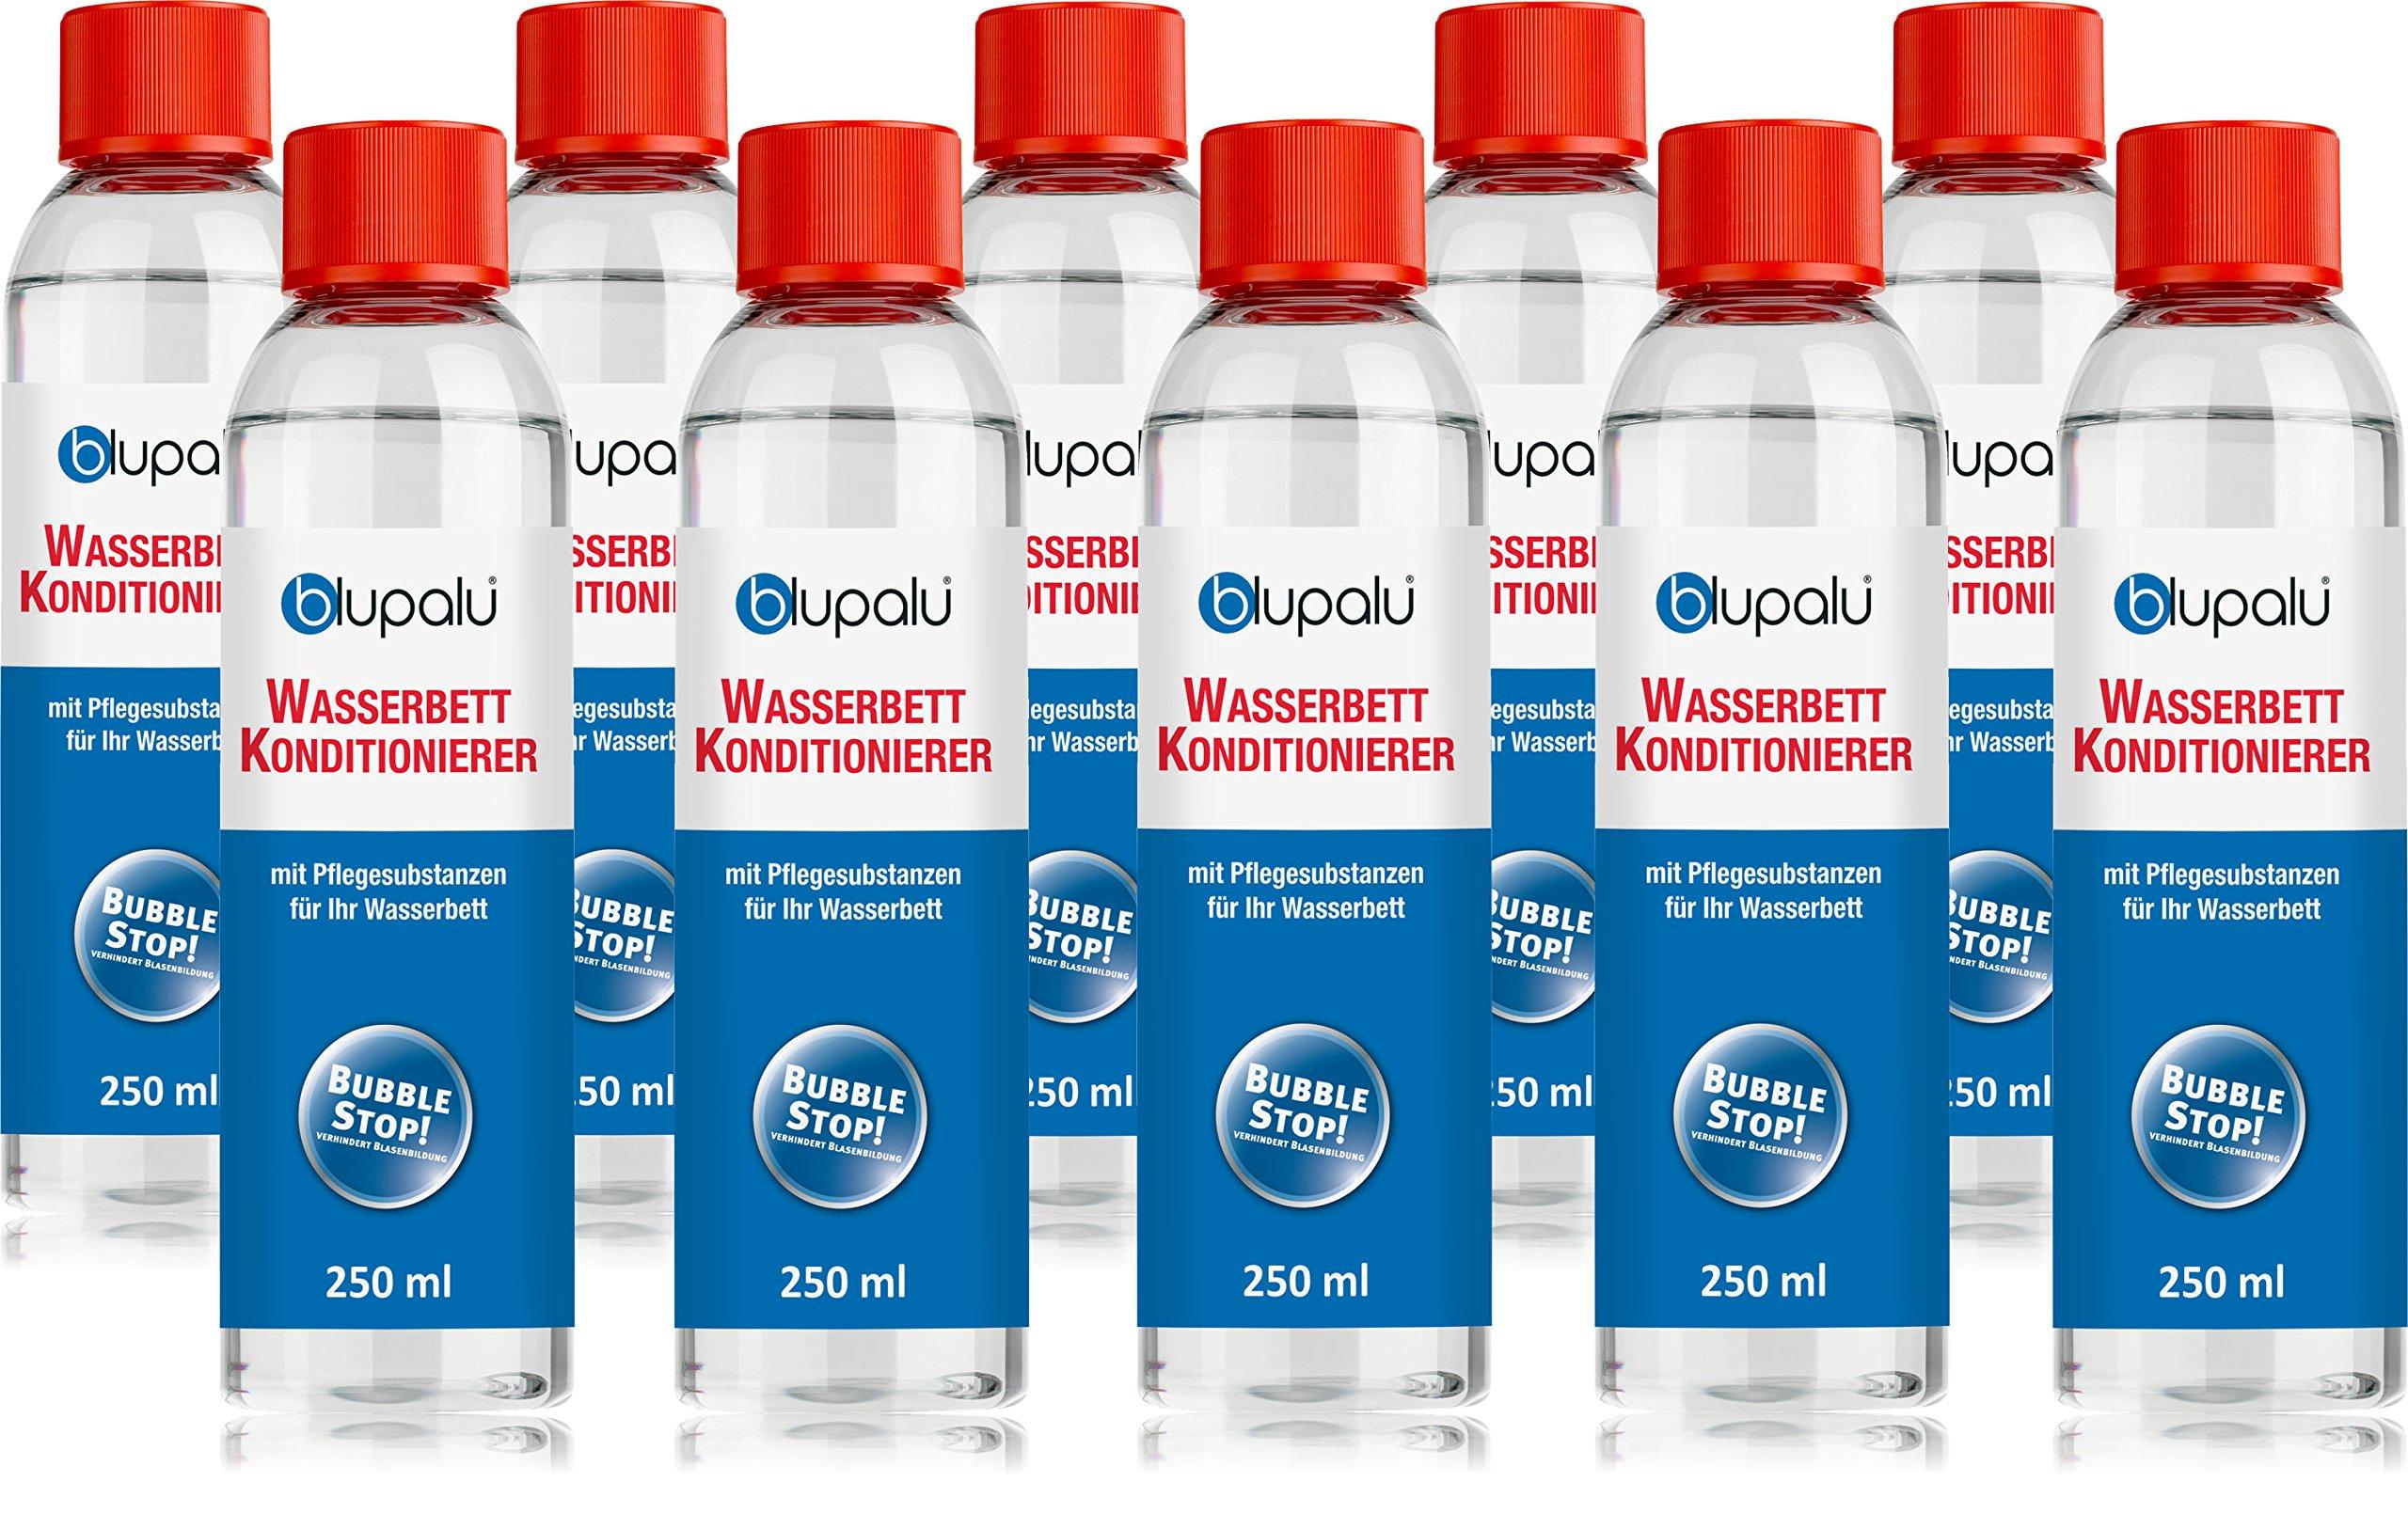 Berühmt Am besten bewertete Produkte in der Kategorie Wasserbetten - Amazon.de WA77